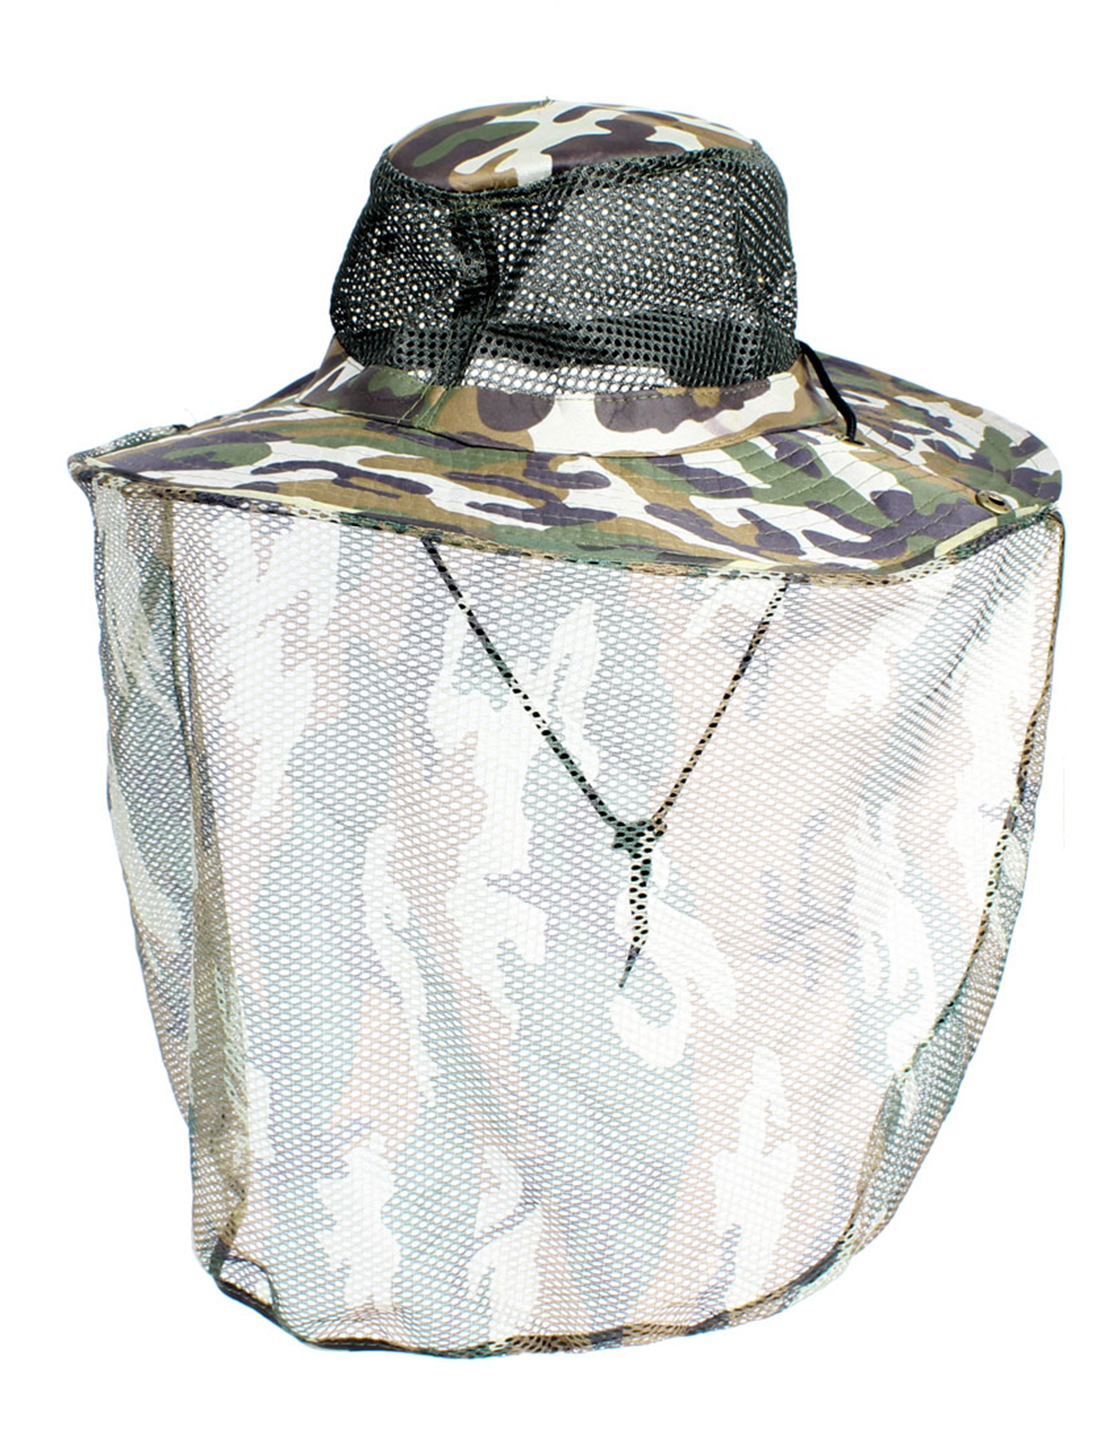 Unisex Adjustable Chin Strap Camouflage Pattern Flap Bucket Hat